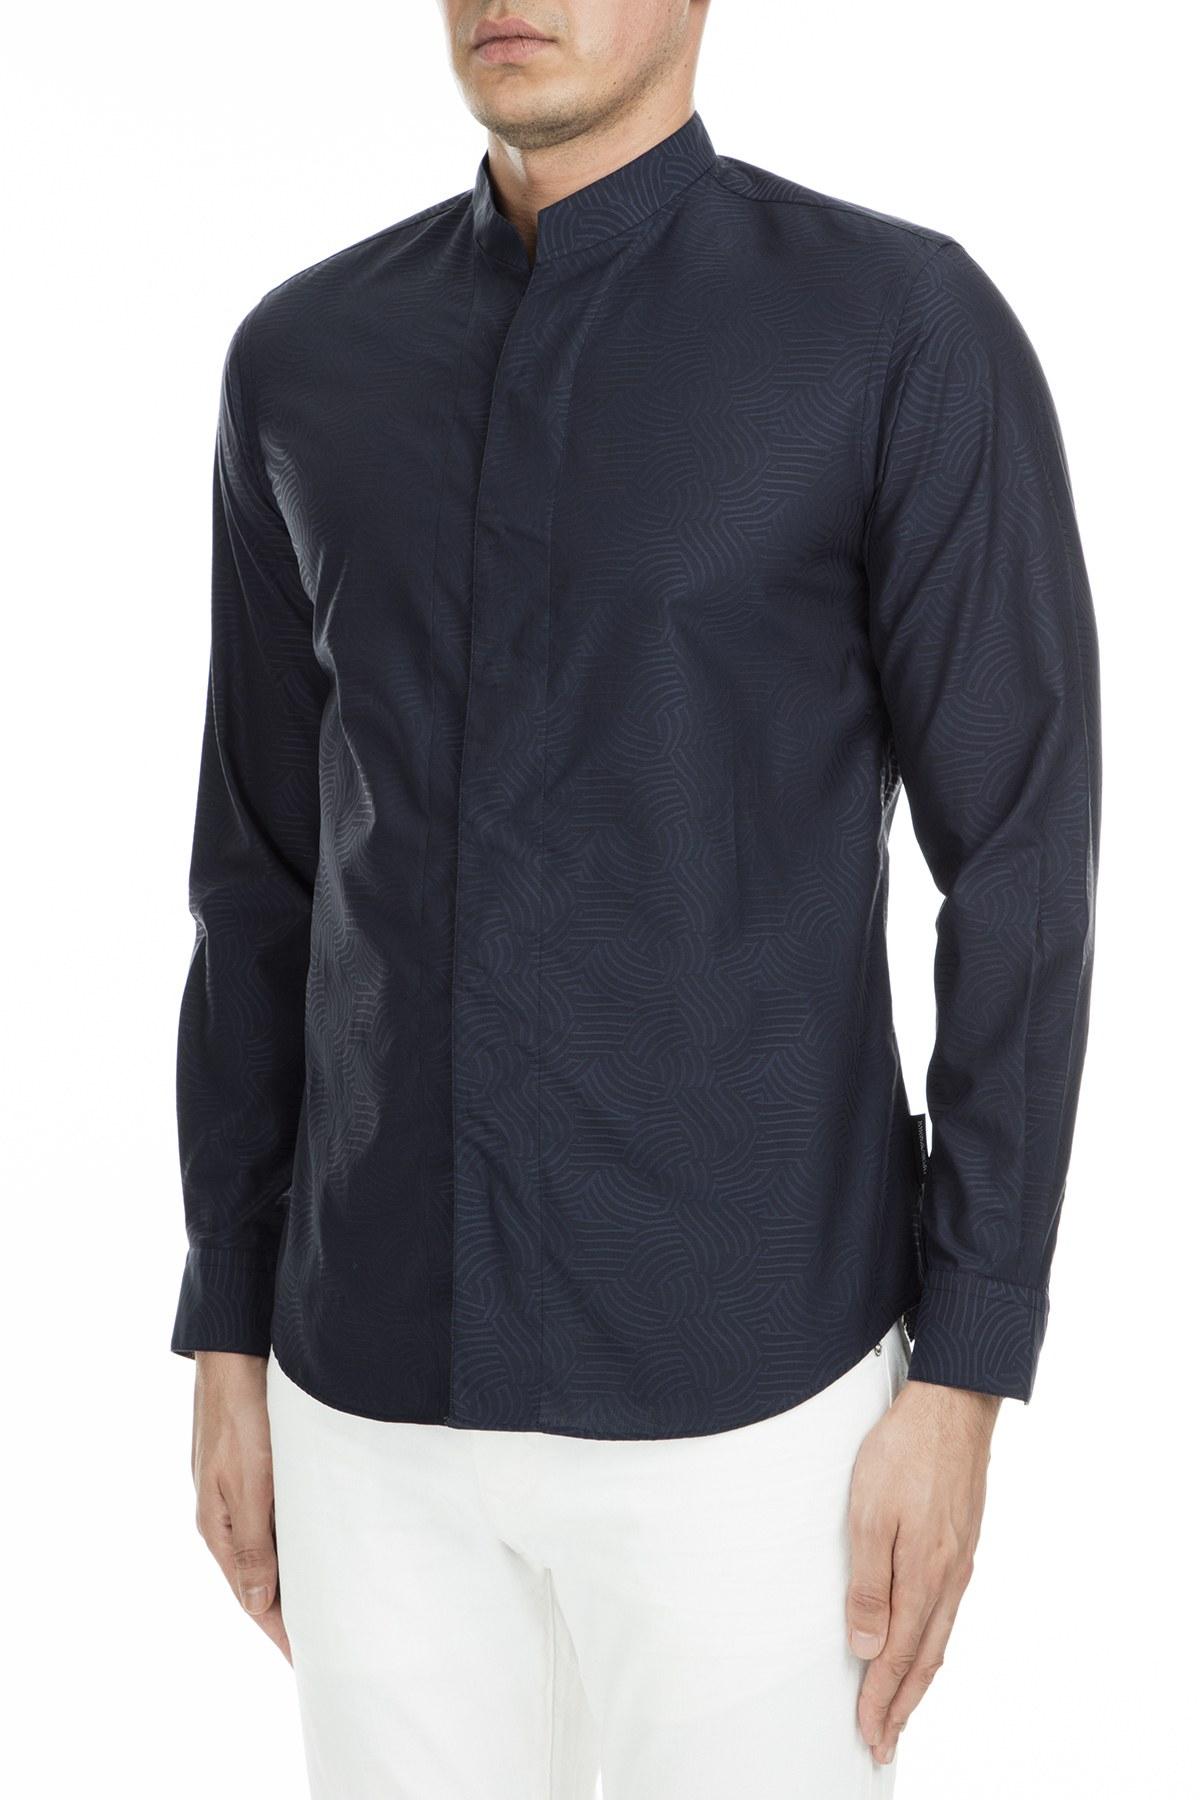 Emporio Armani Erkek Gömlek 21SMQL 212F7 041 SİYAH